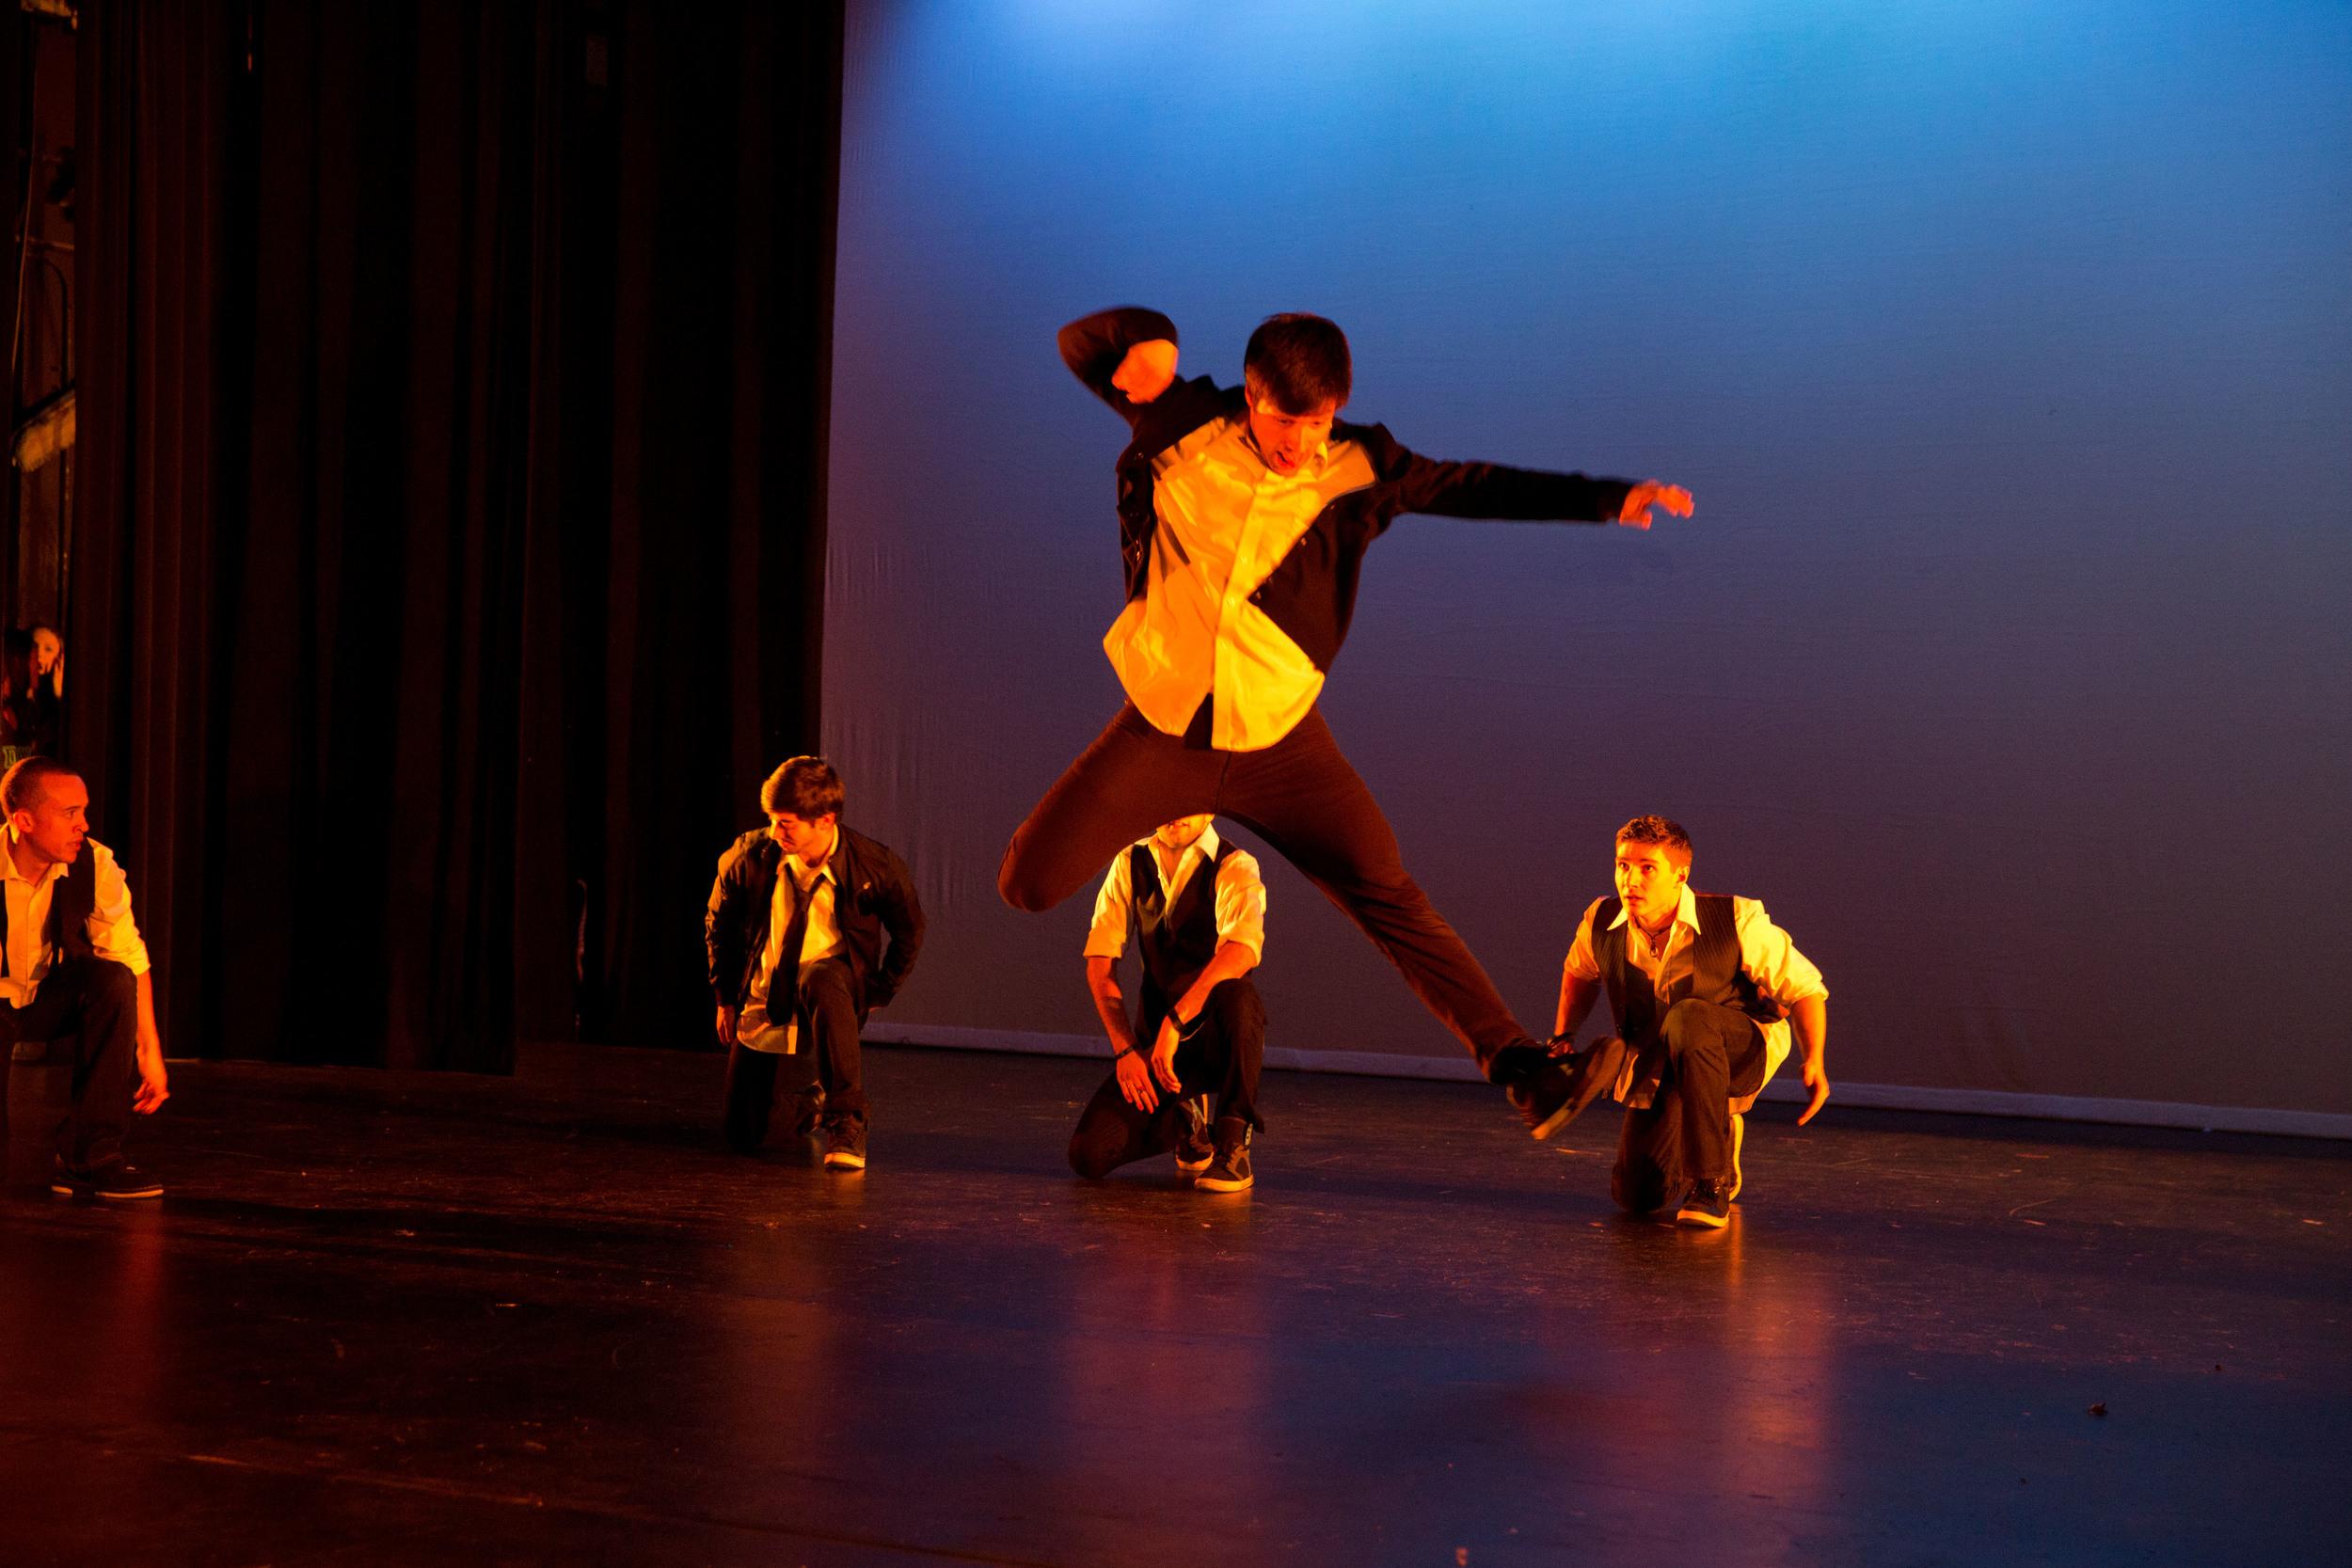 danceworks0176.jpg